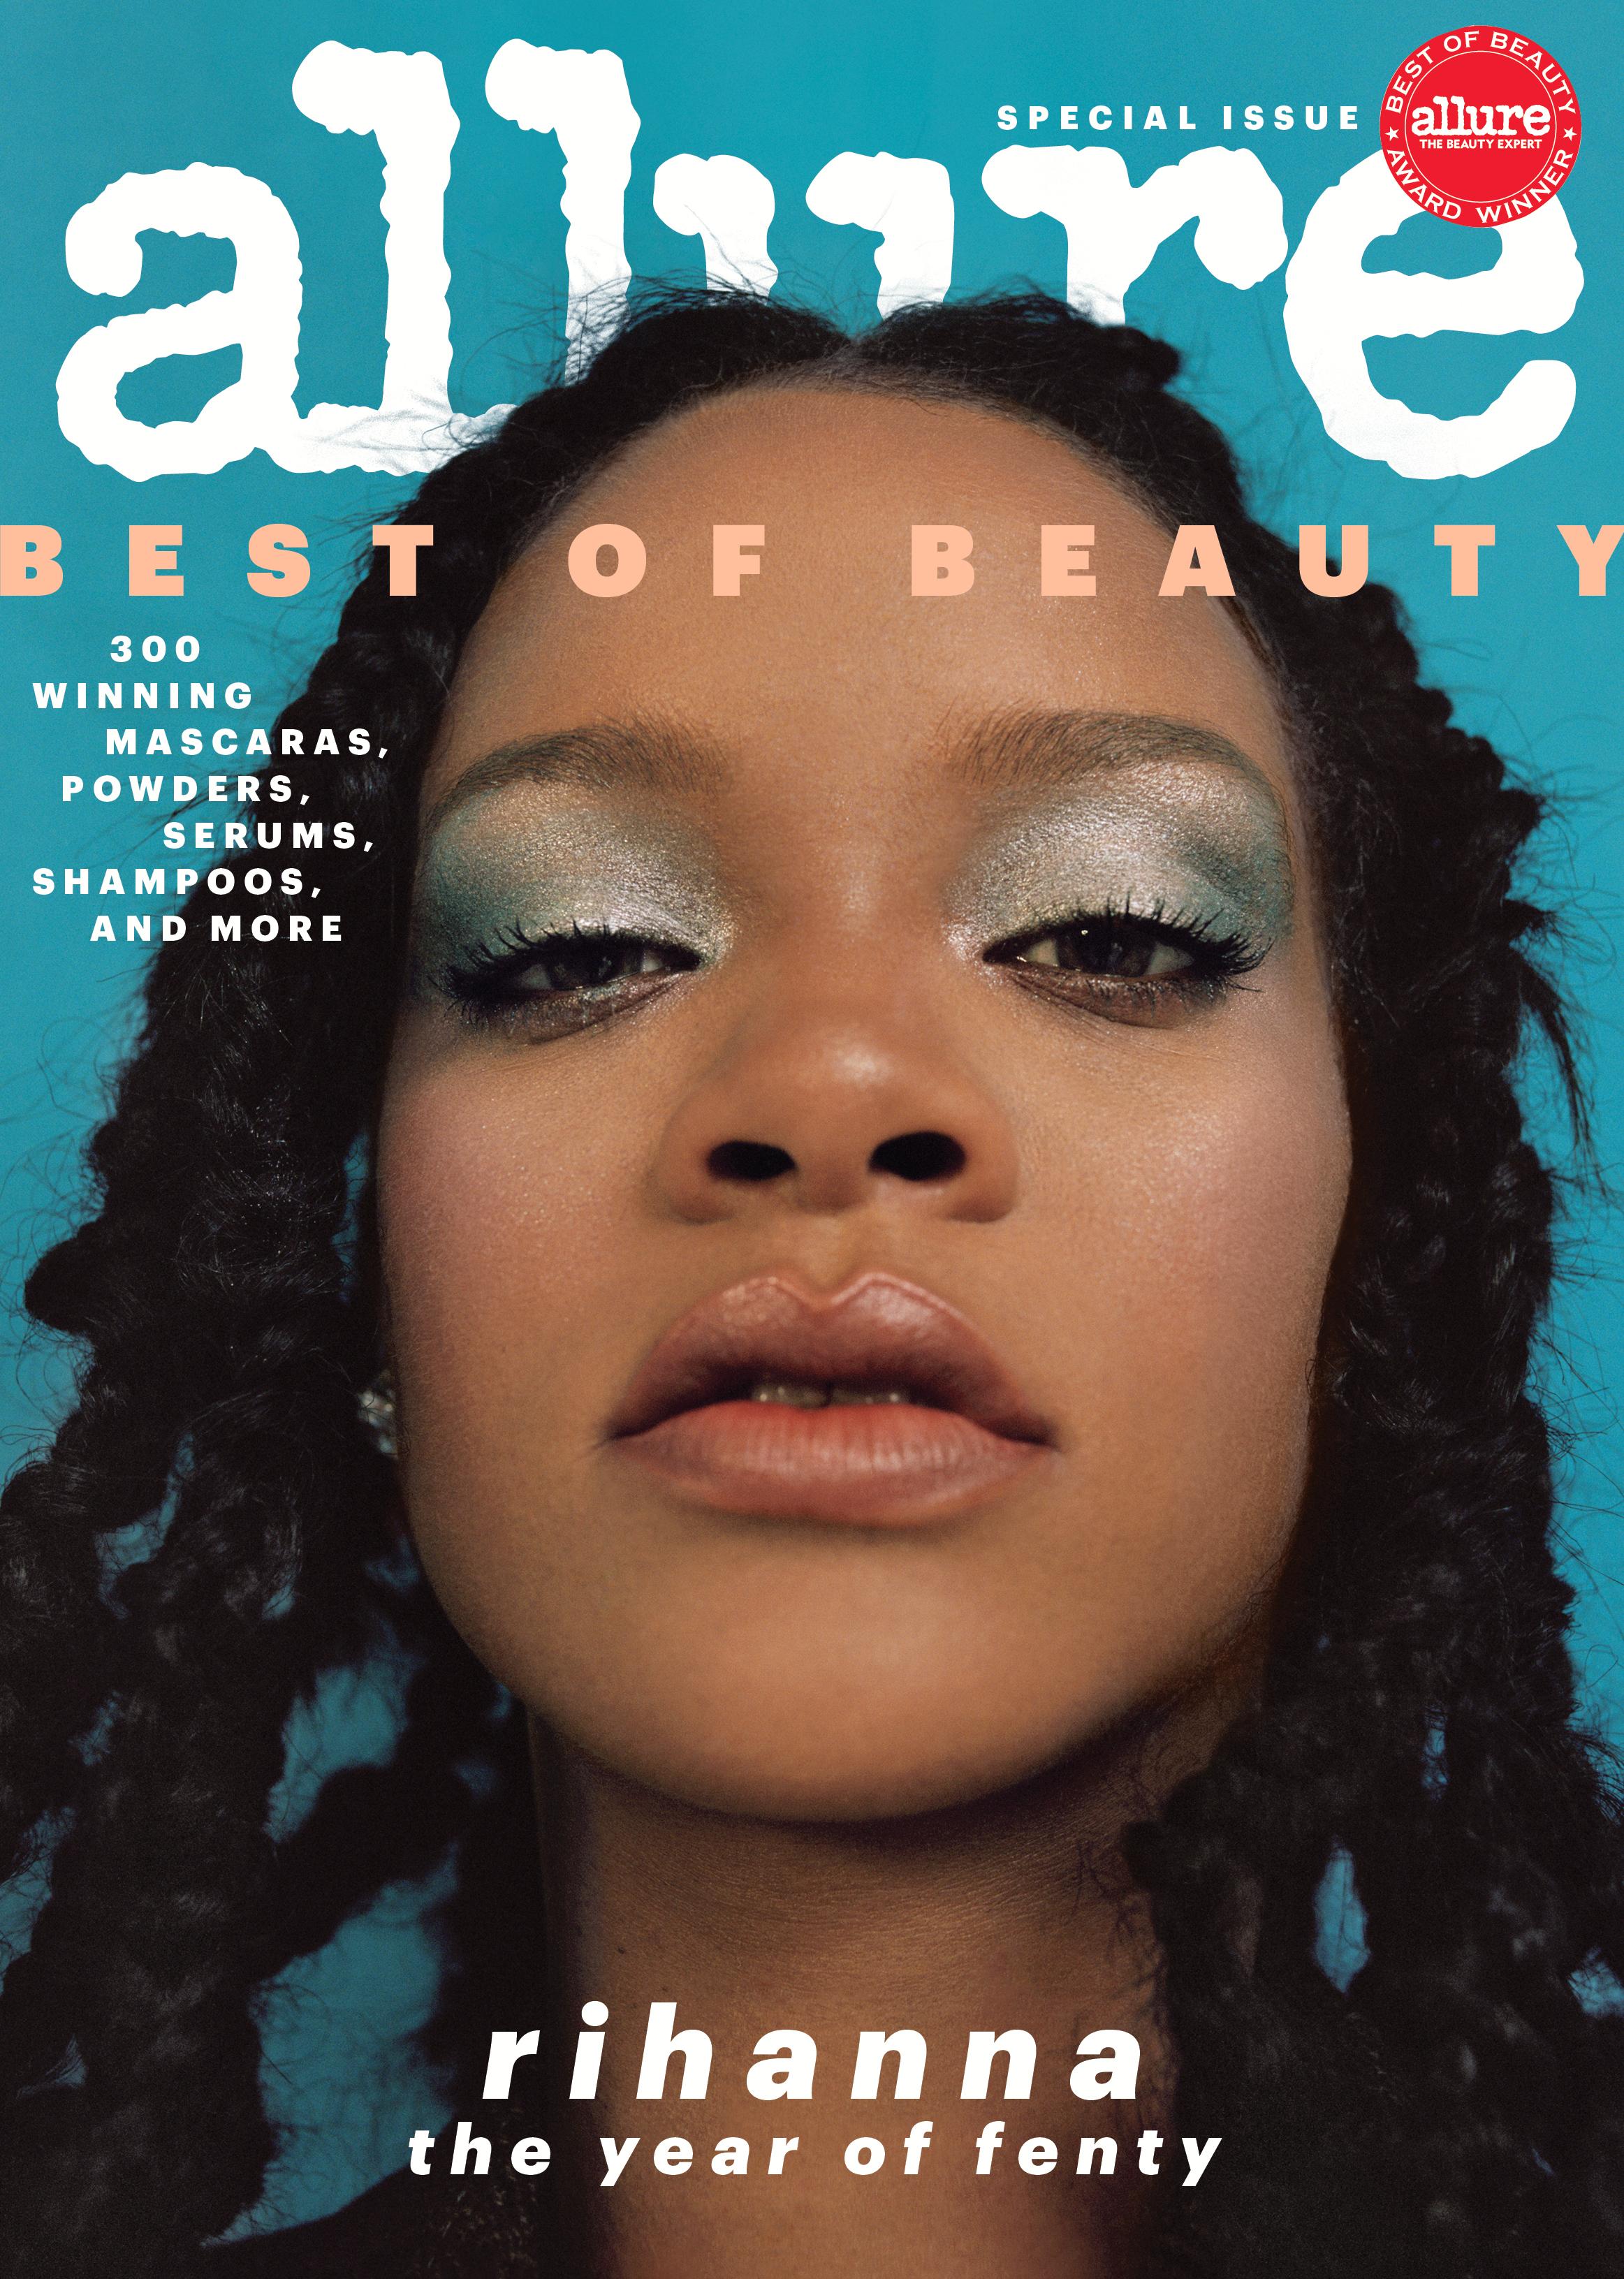 AL100118Cover_Rihanna_lo_20483818;37_View2.jpg